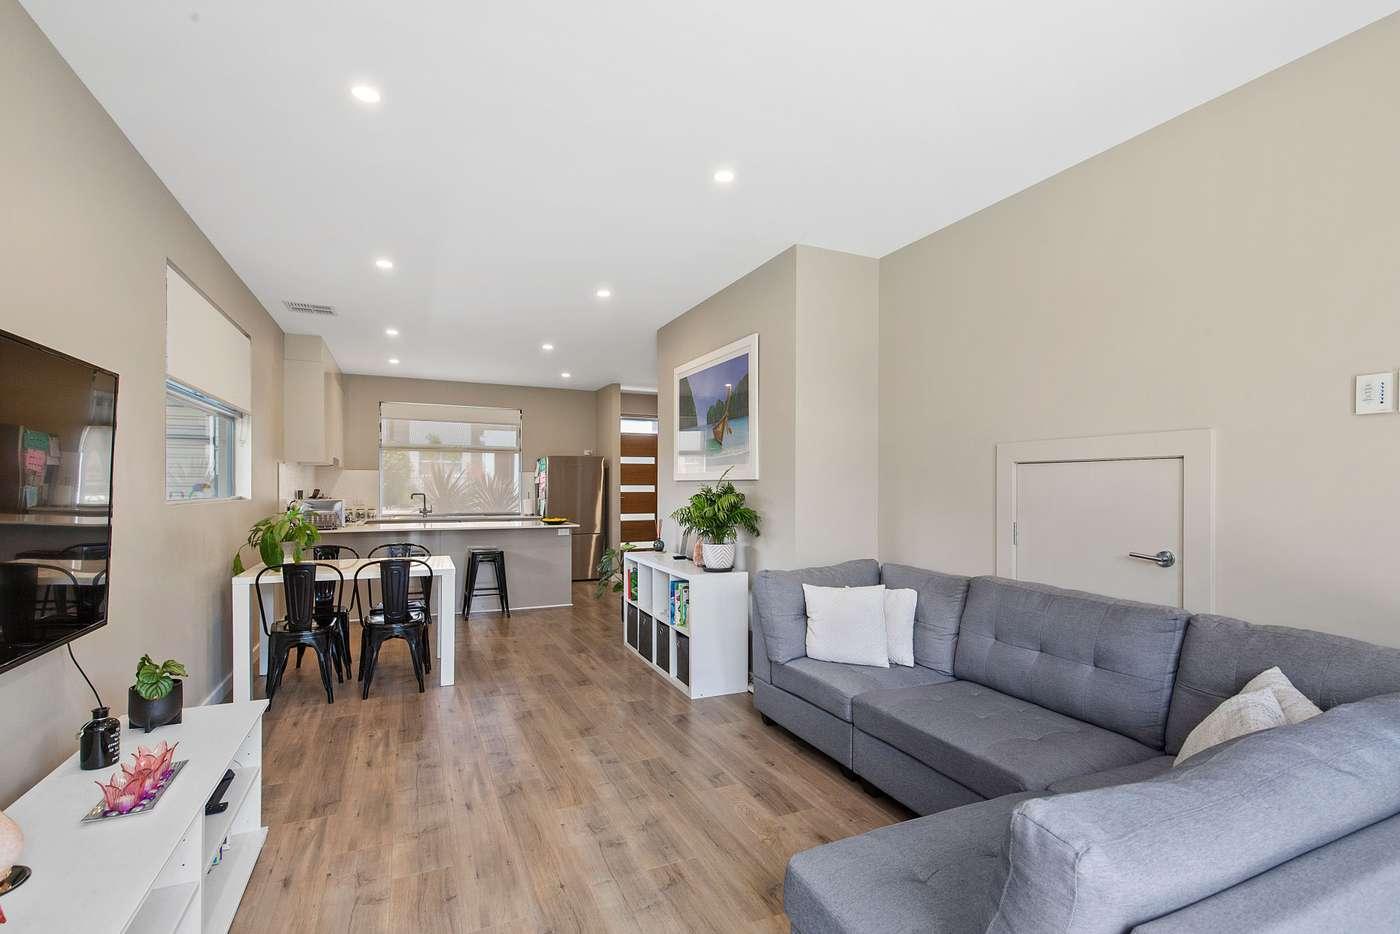 Sixth view of Homely house listing, 23B Grazing Avenue, Morphett Vale SA 5162